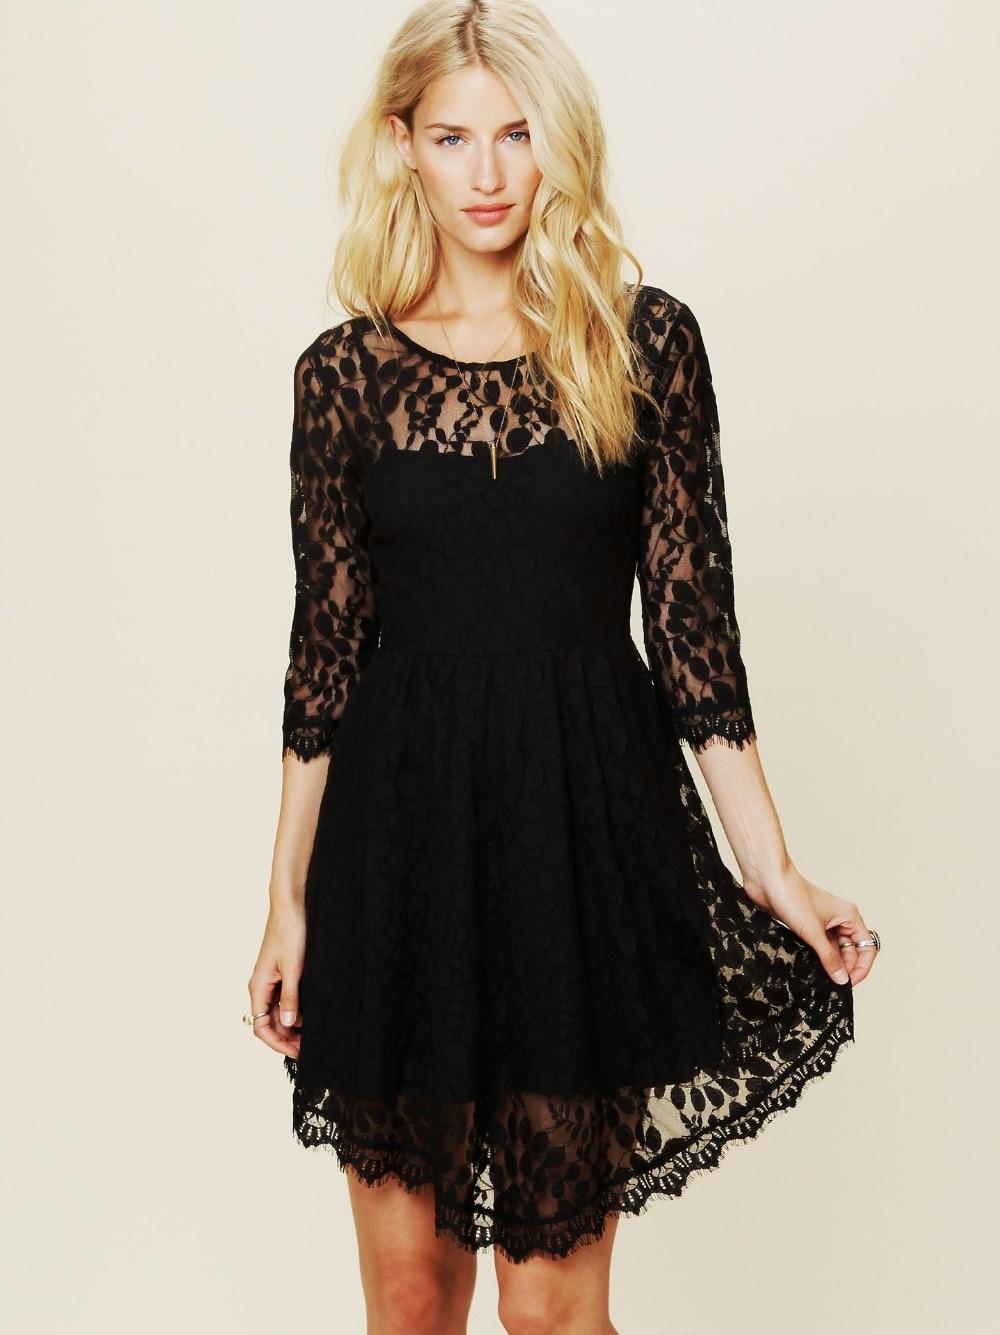 Mori girls vintage hippie blue black half sleeve asymmetrical lace dress brand design bohemian cutout dresses blouse vestidos